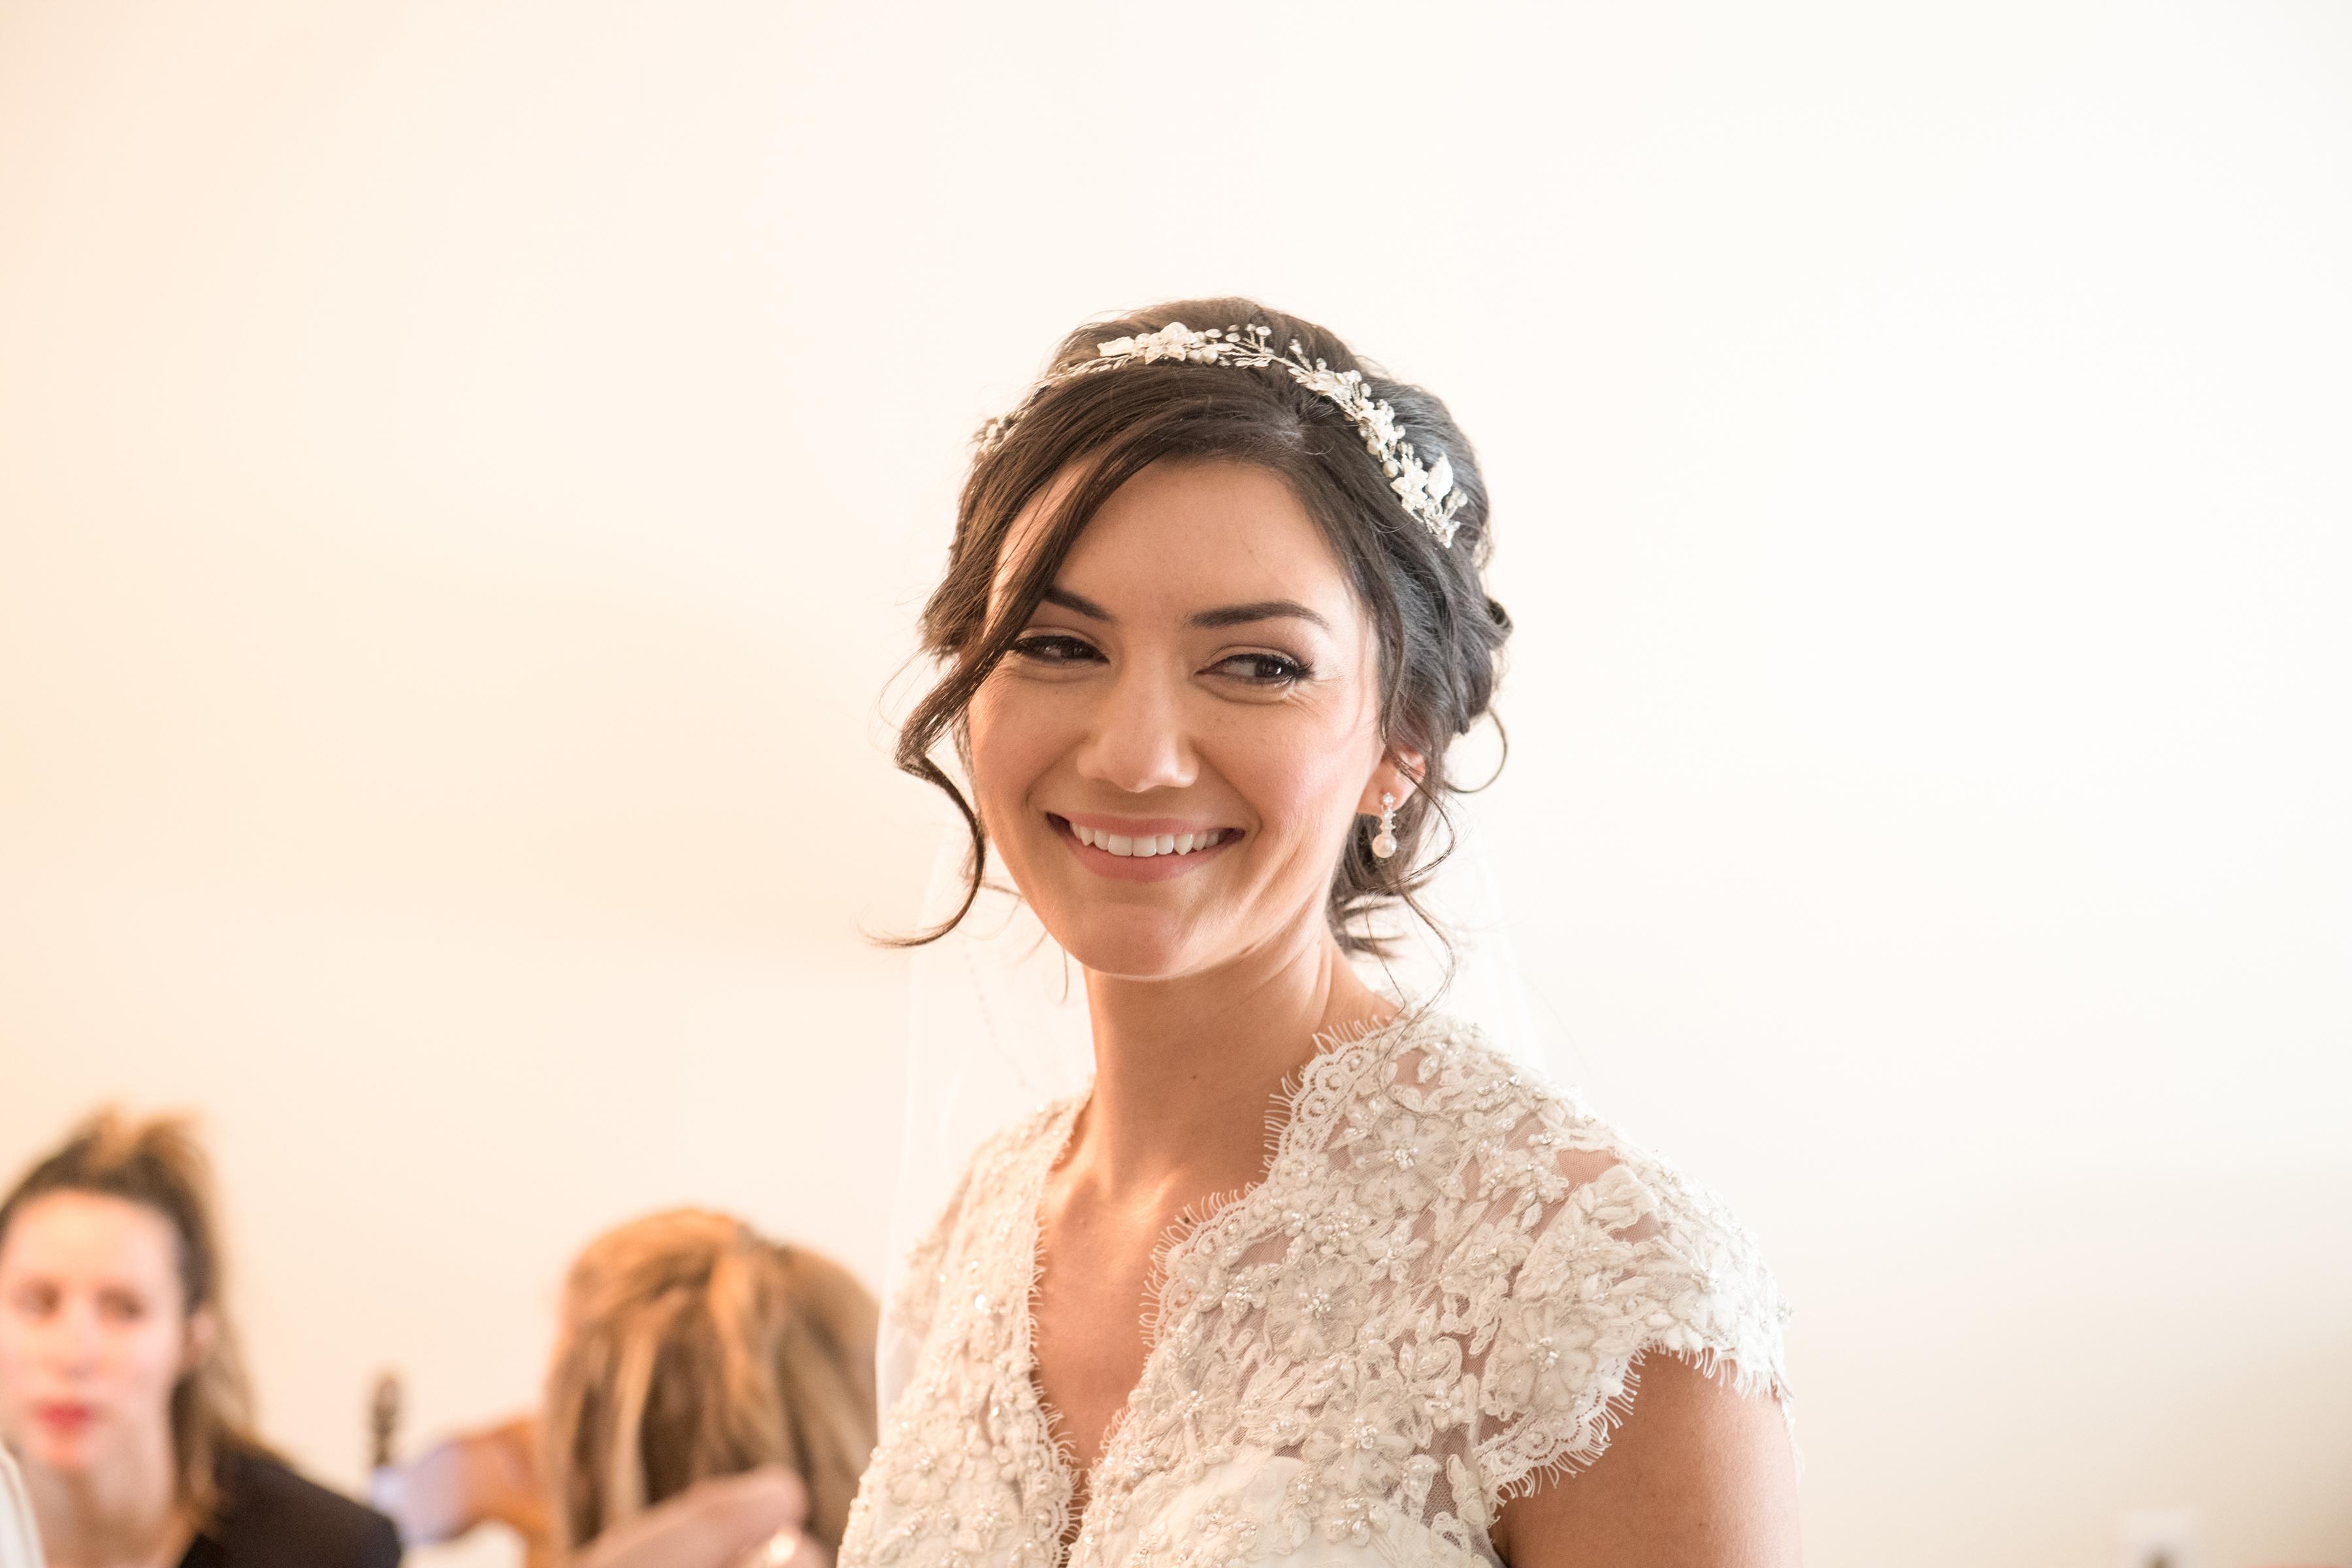 Bridal makeup with a natural glow